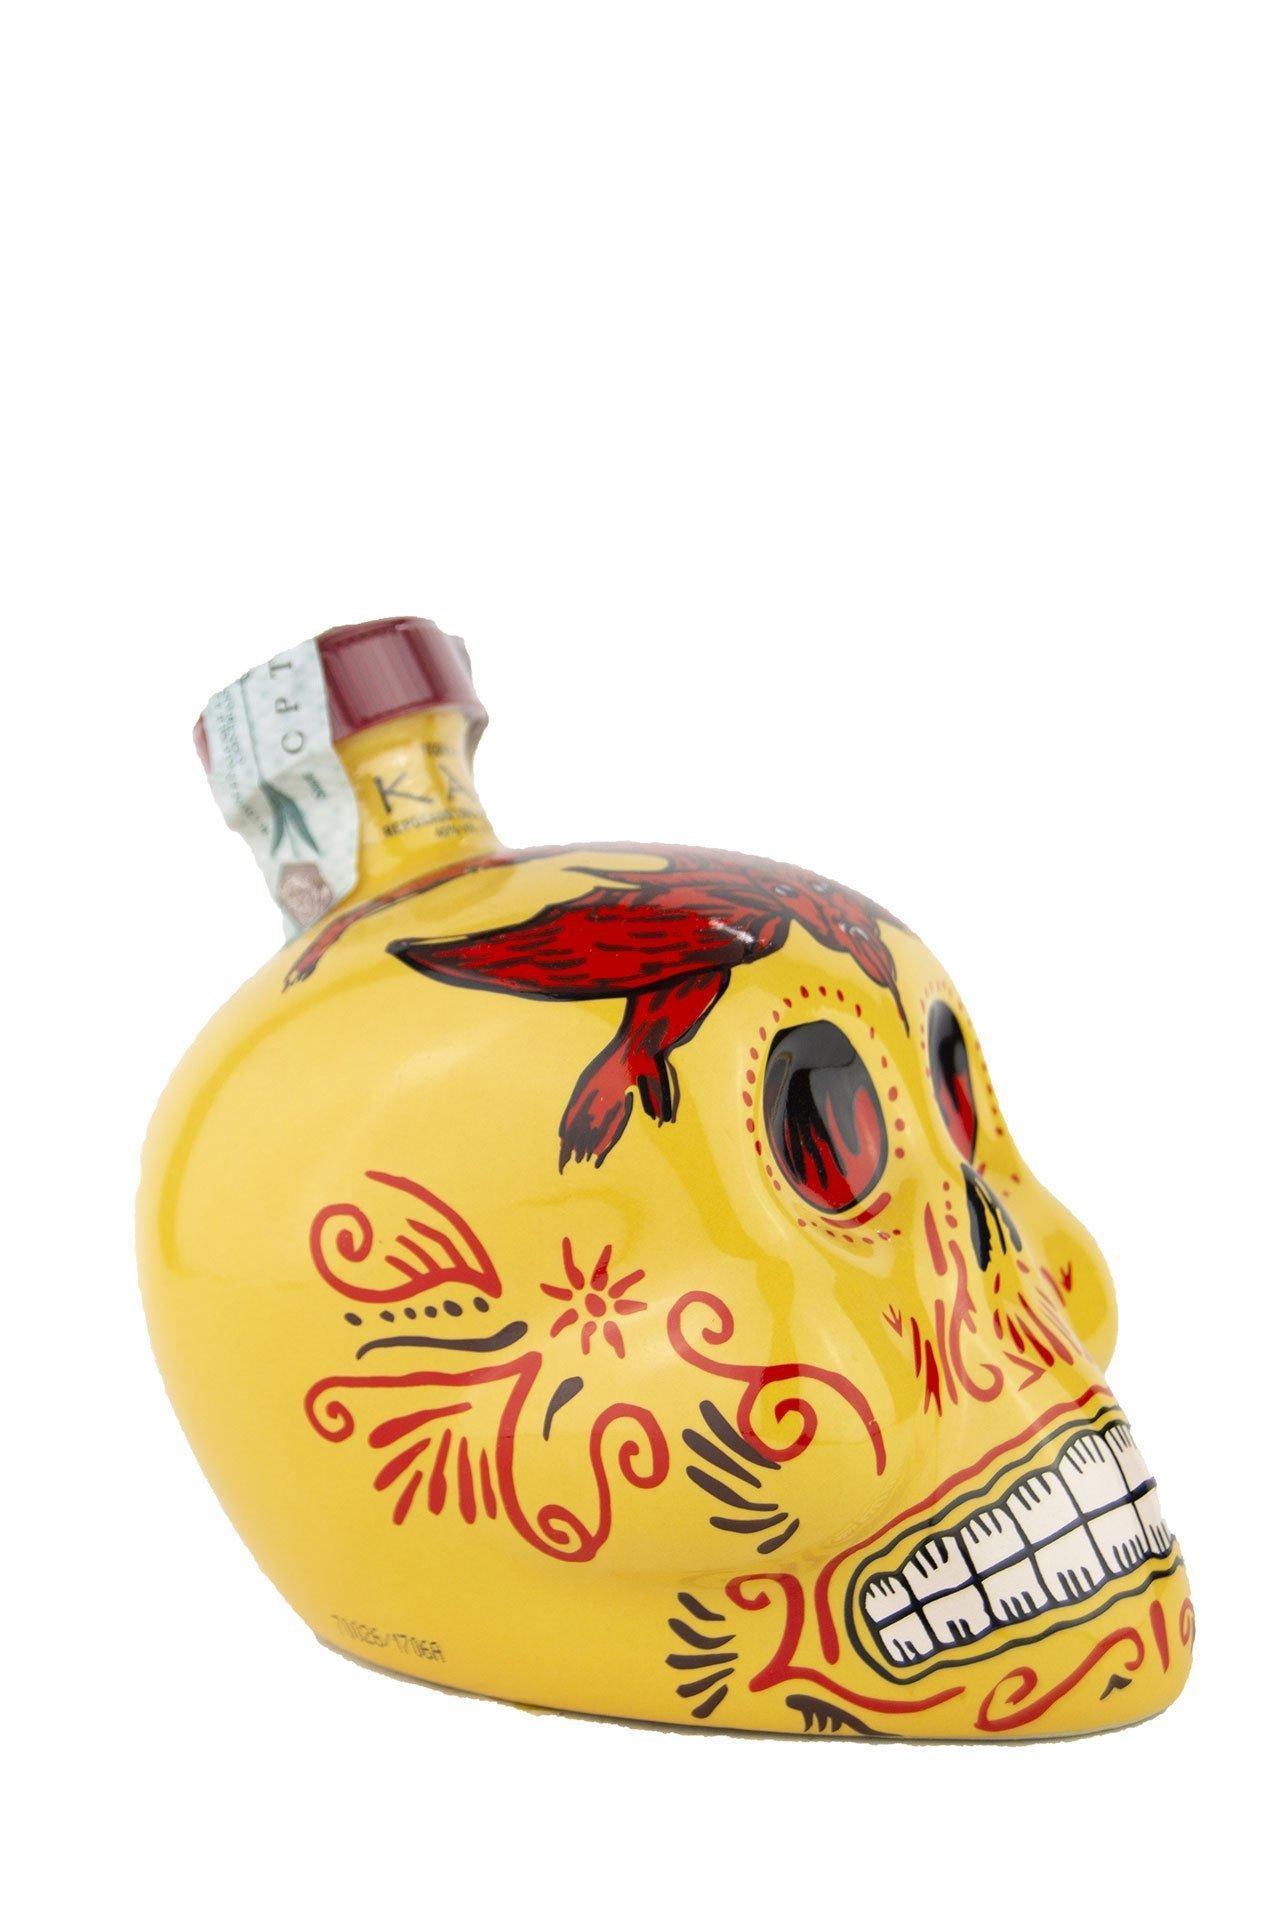 Kah – Tequila Reposado